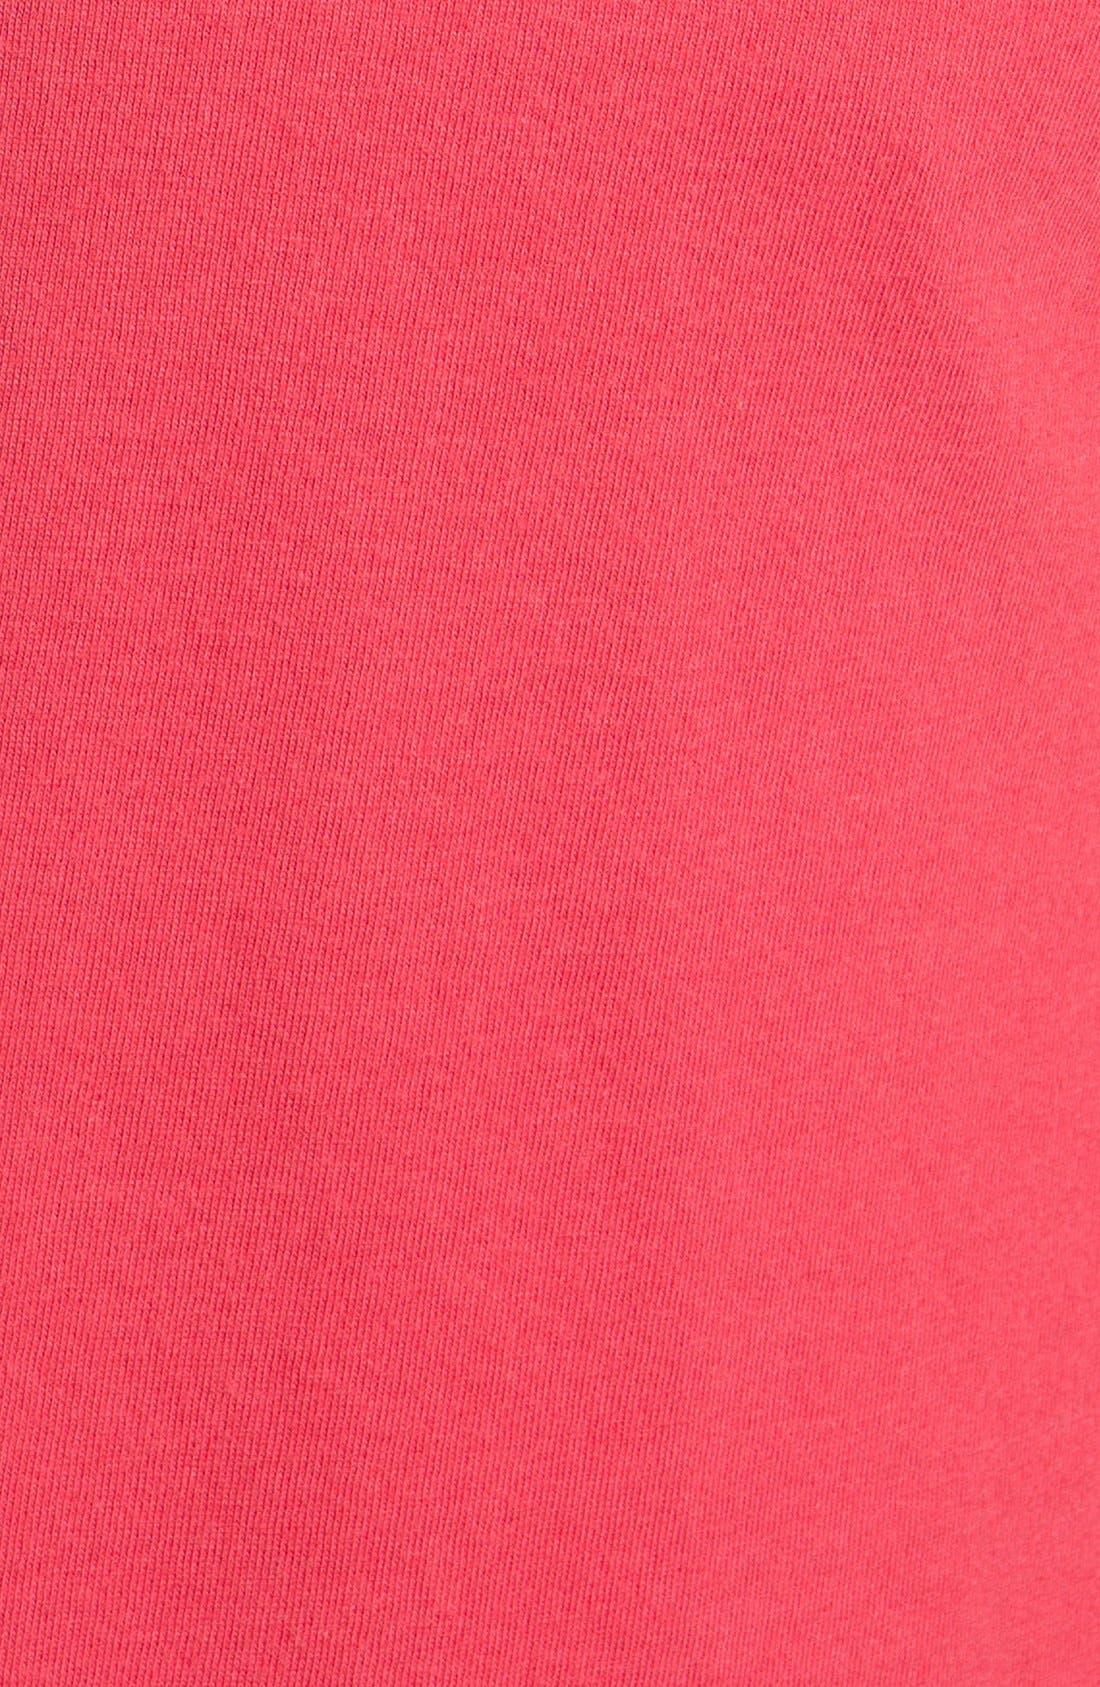 Alternate Image 3  - Red Jacket 'Twins - Brass Tacks' T-Shirt